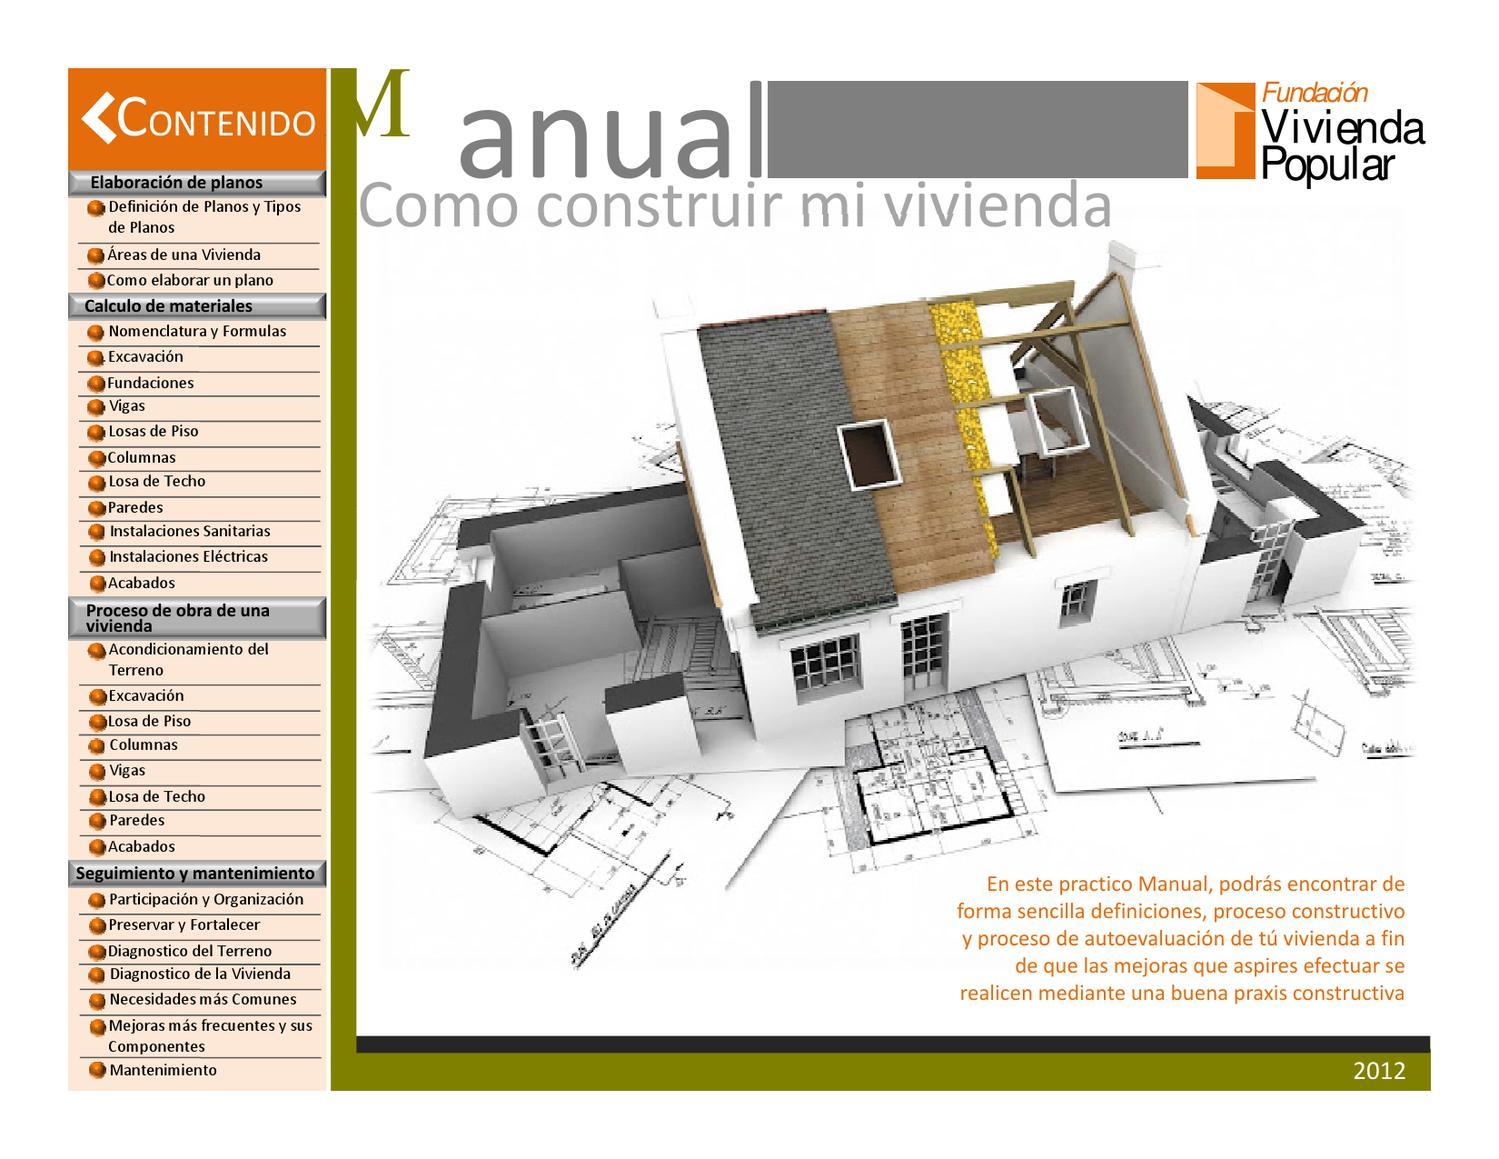 Manual c mo construir mi vivienda by jennifer matute issuu - Construir una vivienda ...